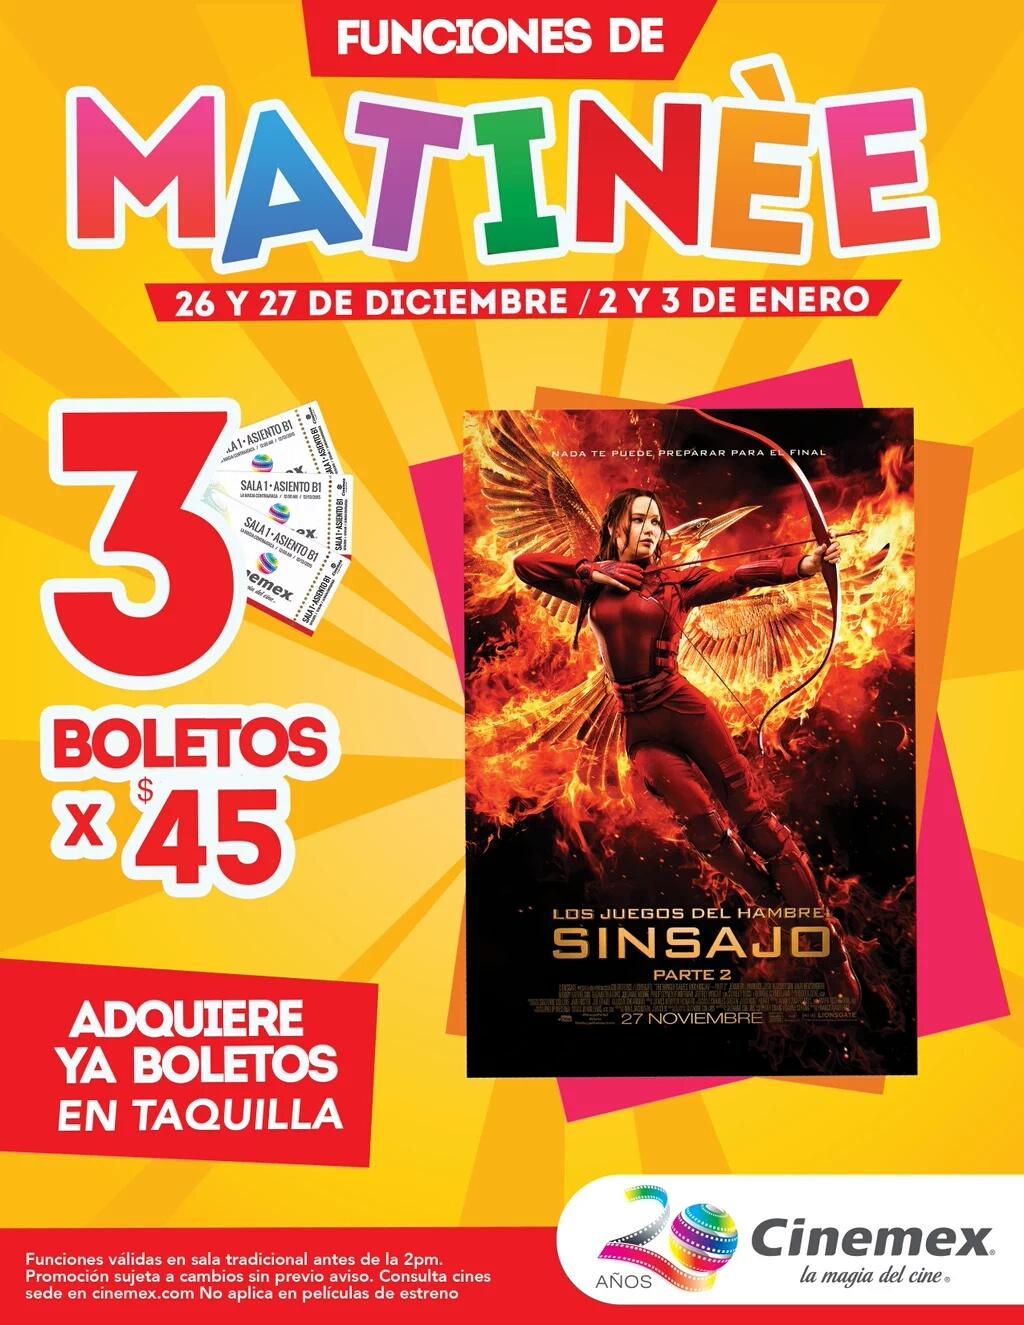 Cinemex: 3 boletos para matinée de Sinsajo parte II por $45